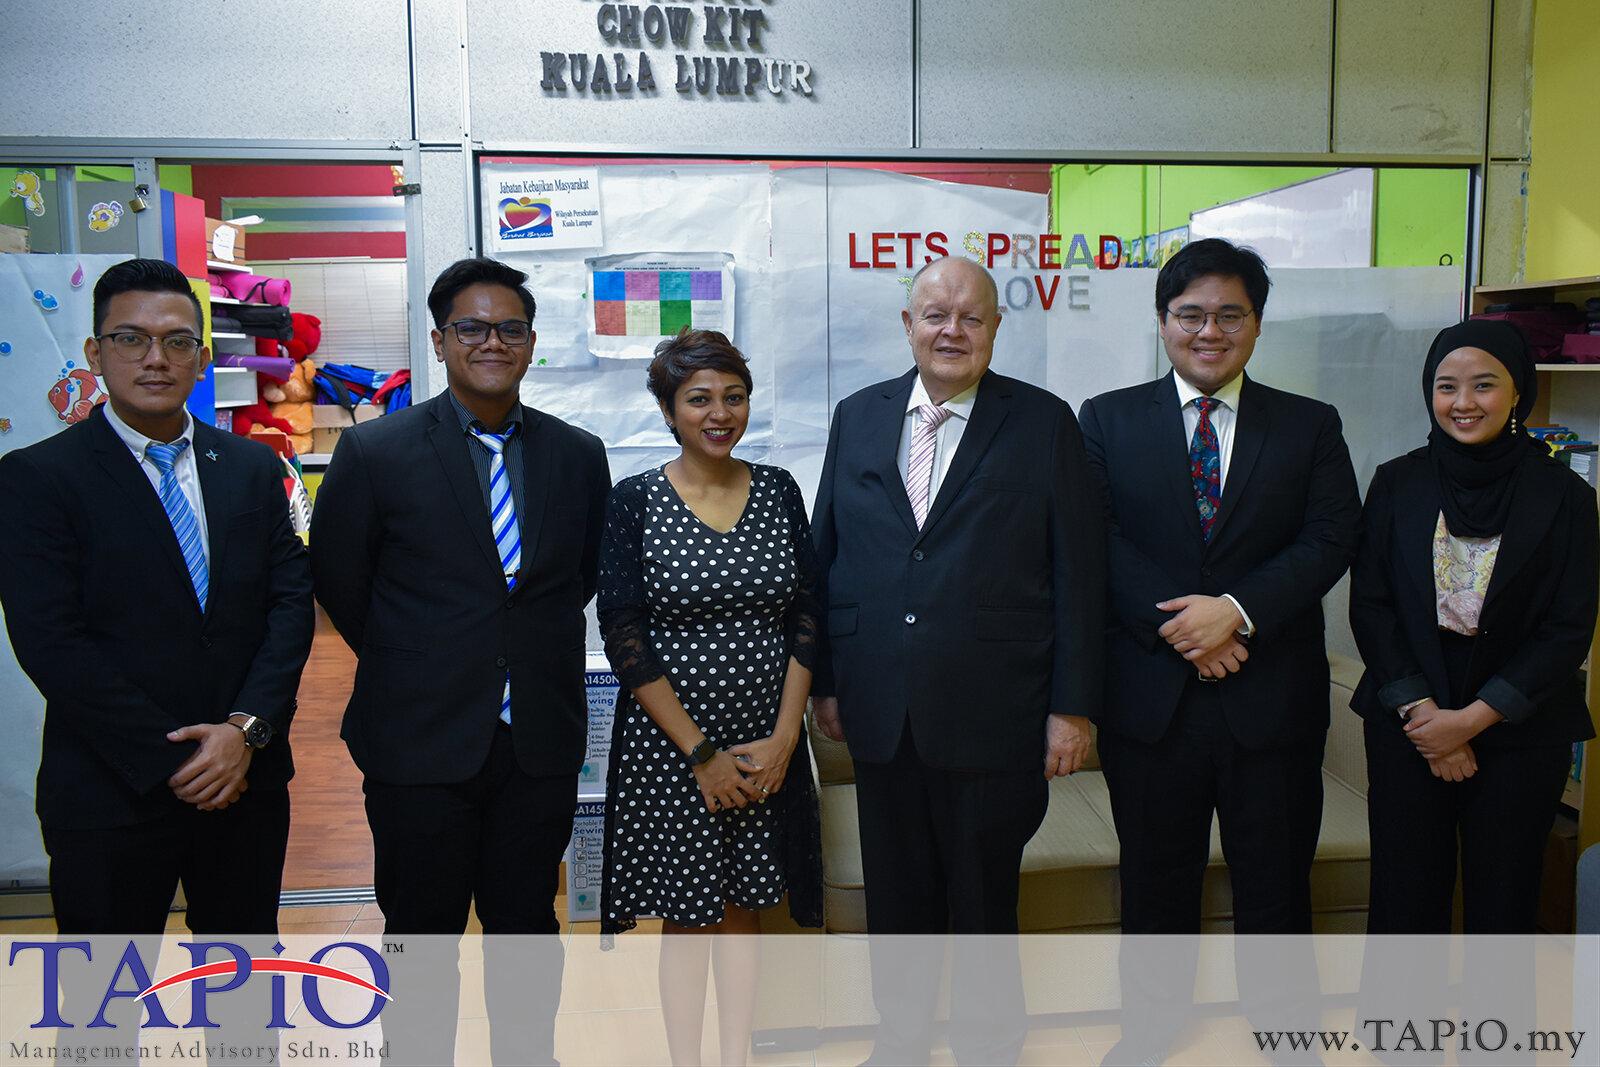 20200313 - Meeting with Yayasan Chow Kit